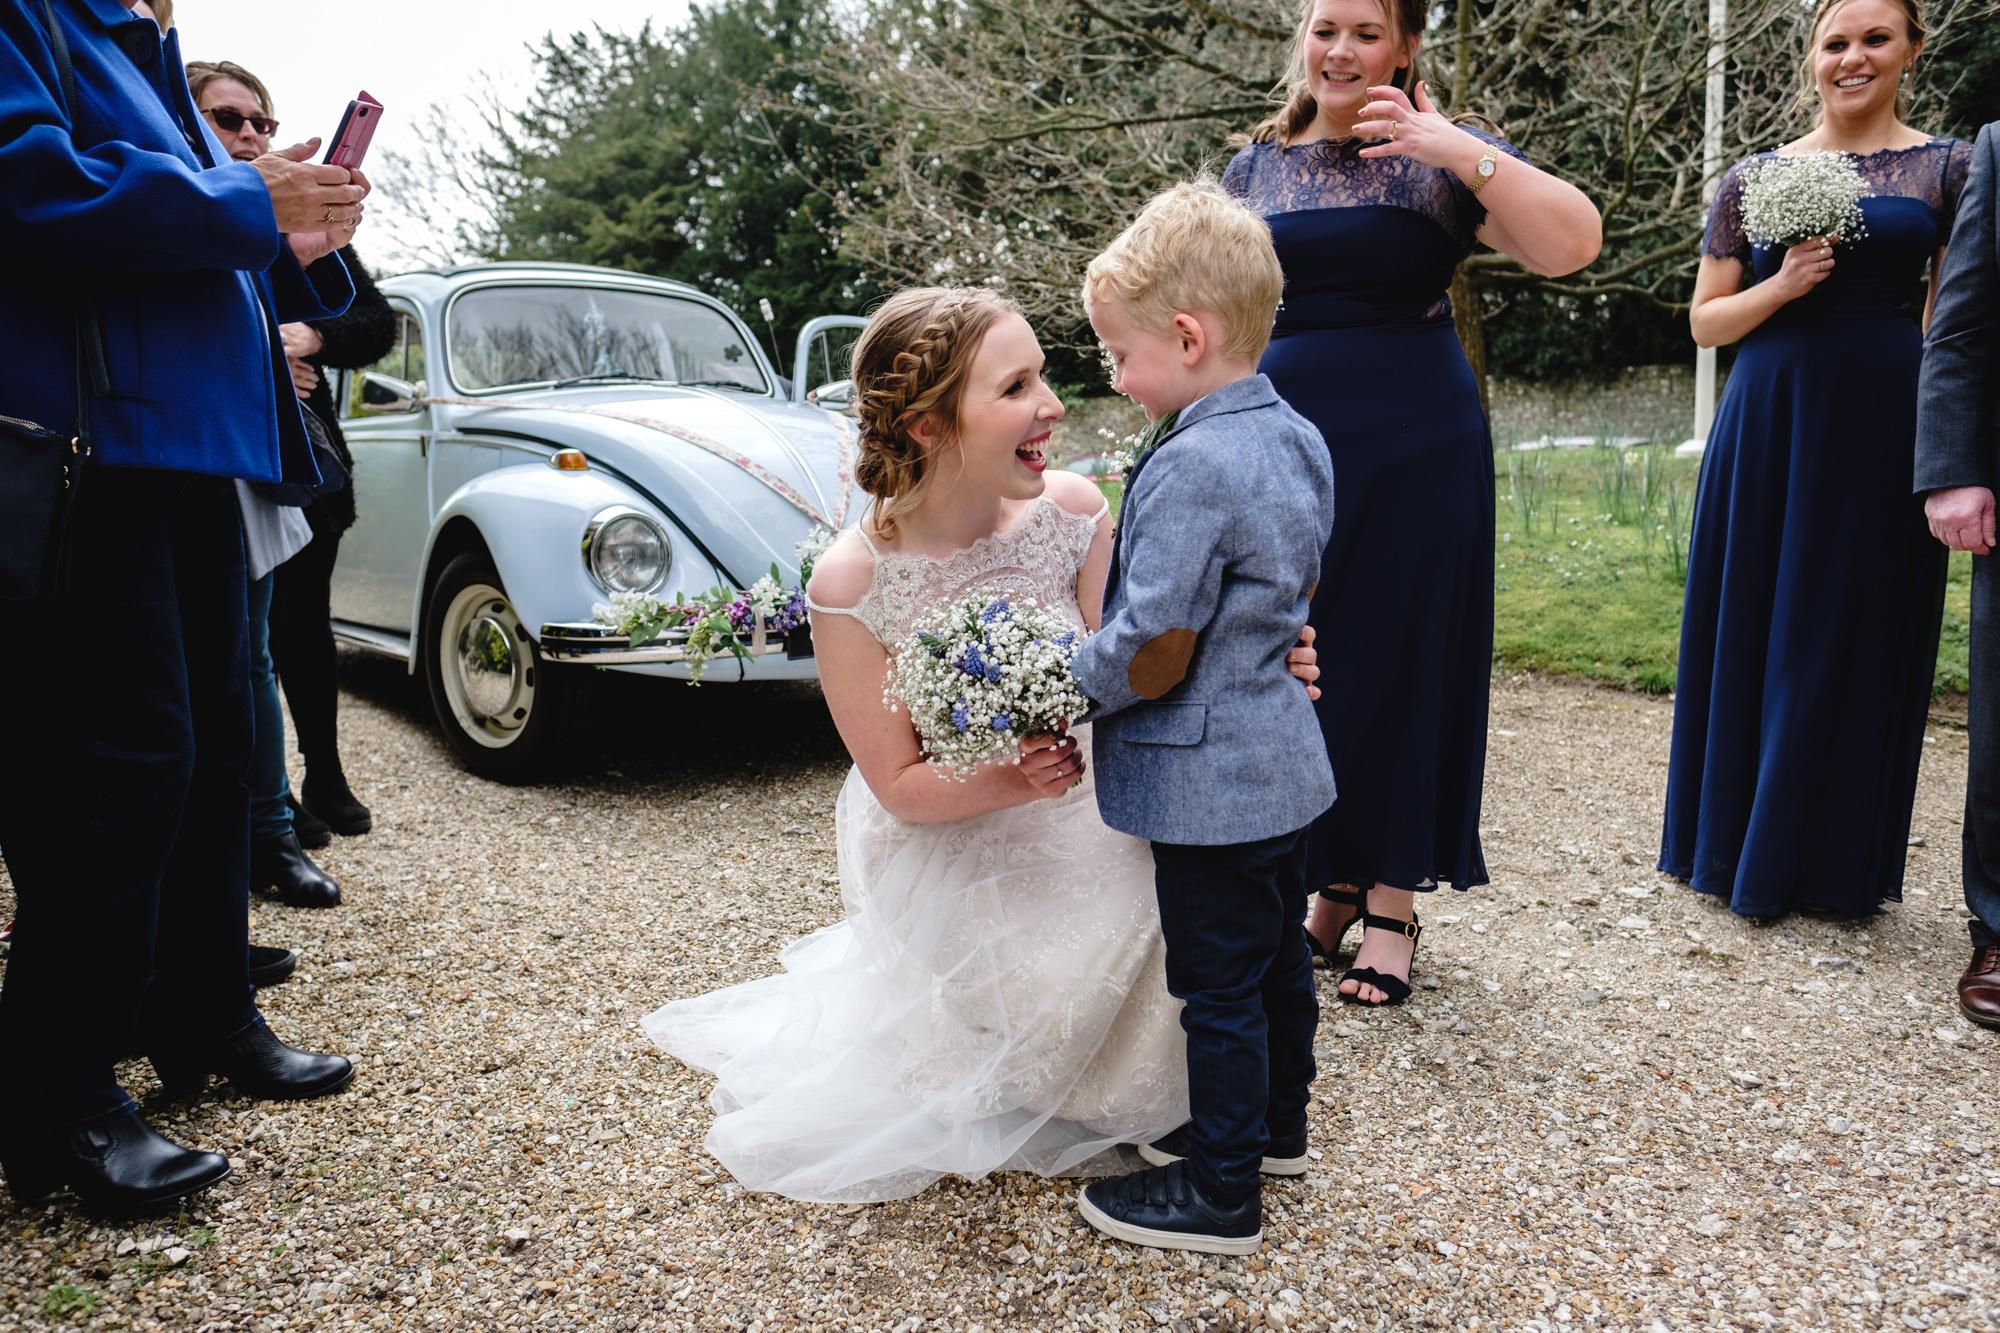 Katie and Dode weddings (33 of 207).jpg